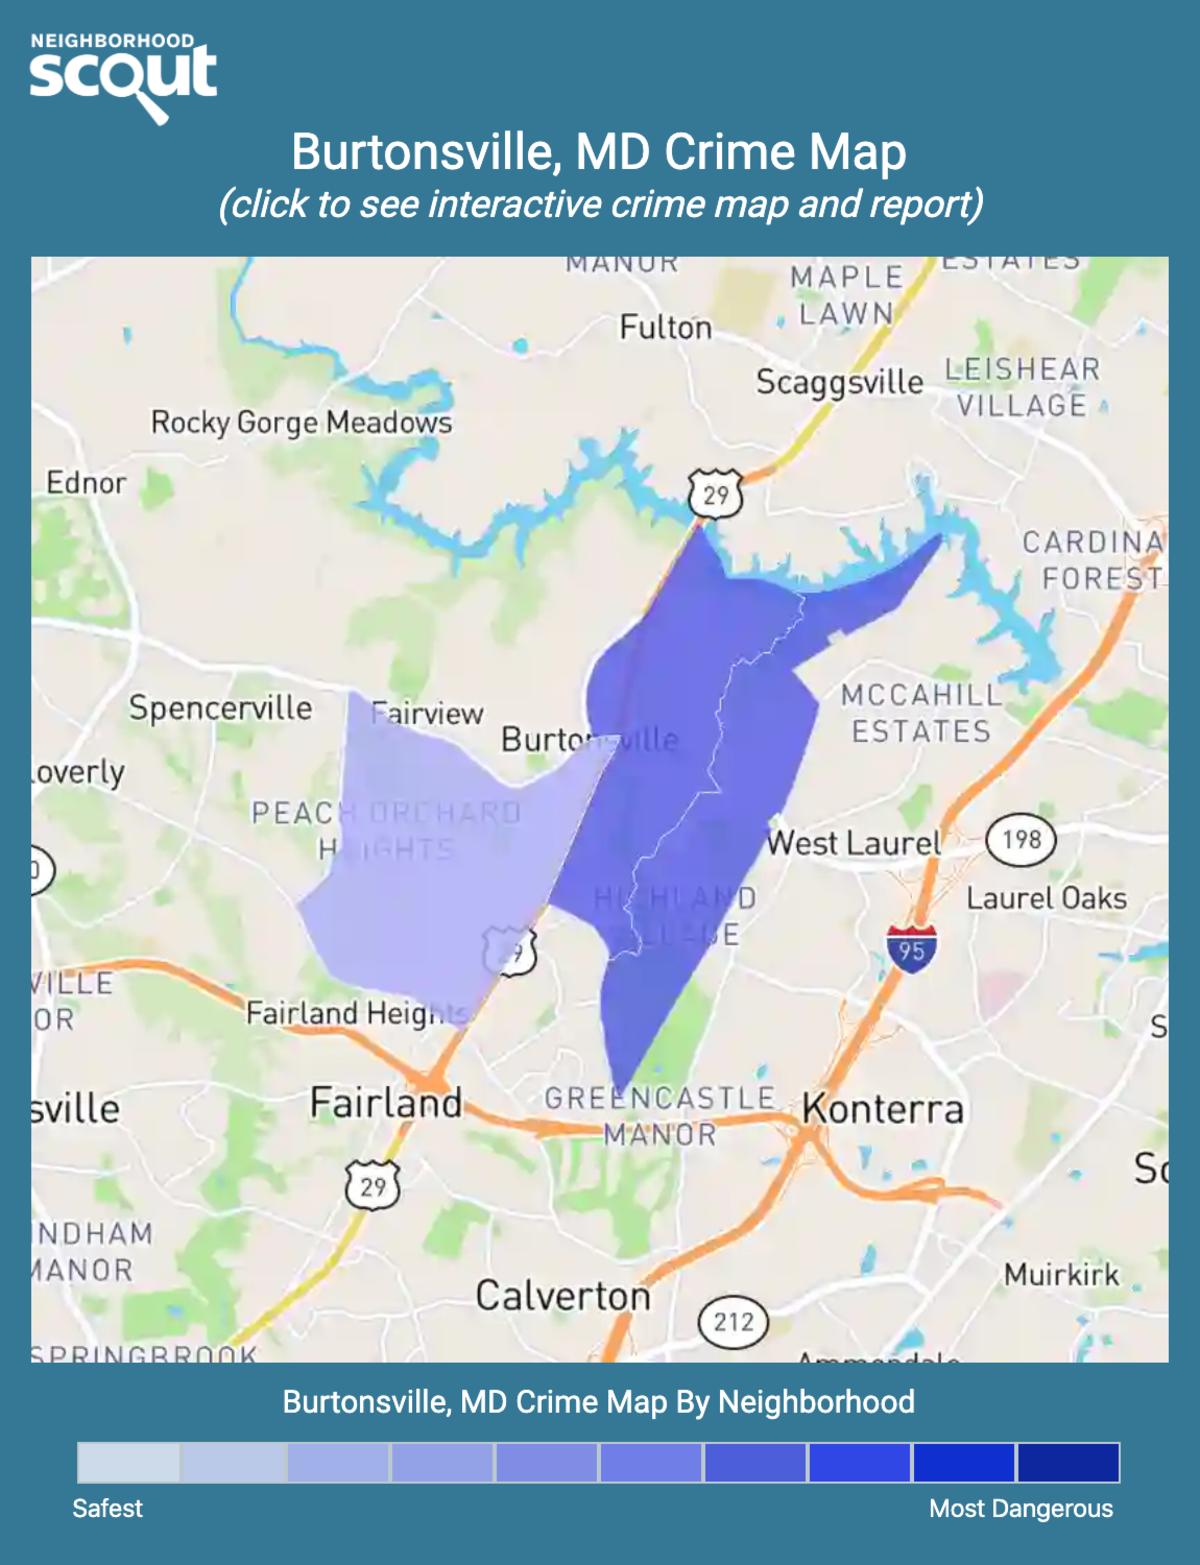 Burtonsville, Maryland crime map